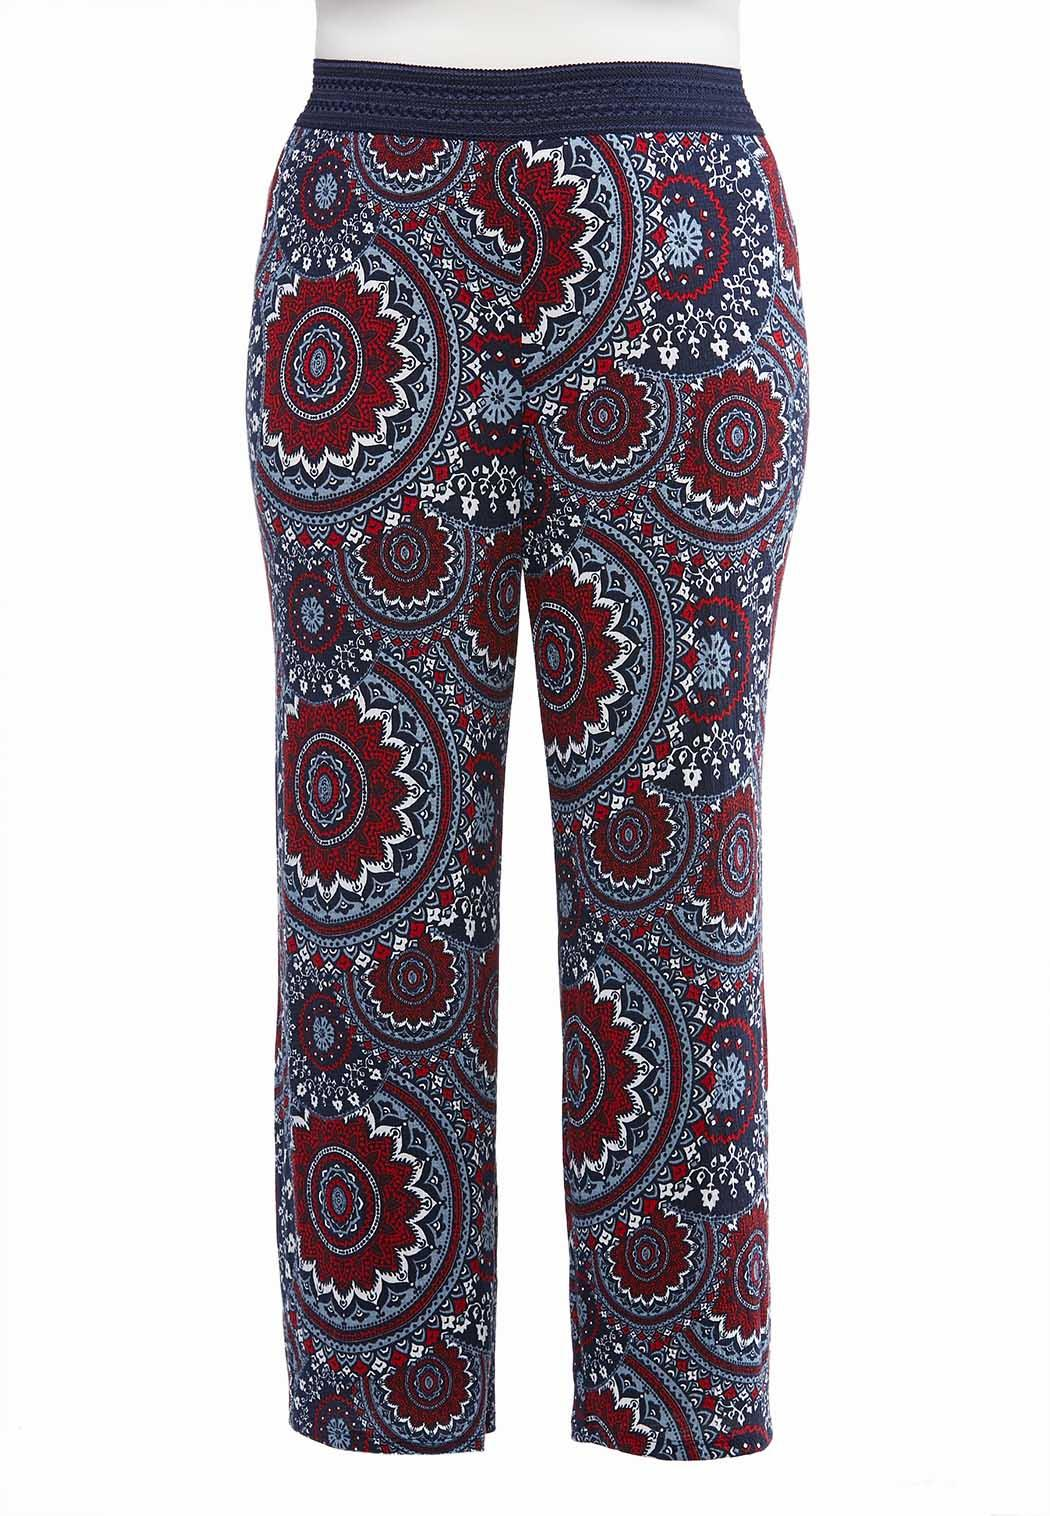 03537797f1ef Women s Plus Size Pants